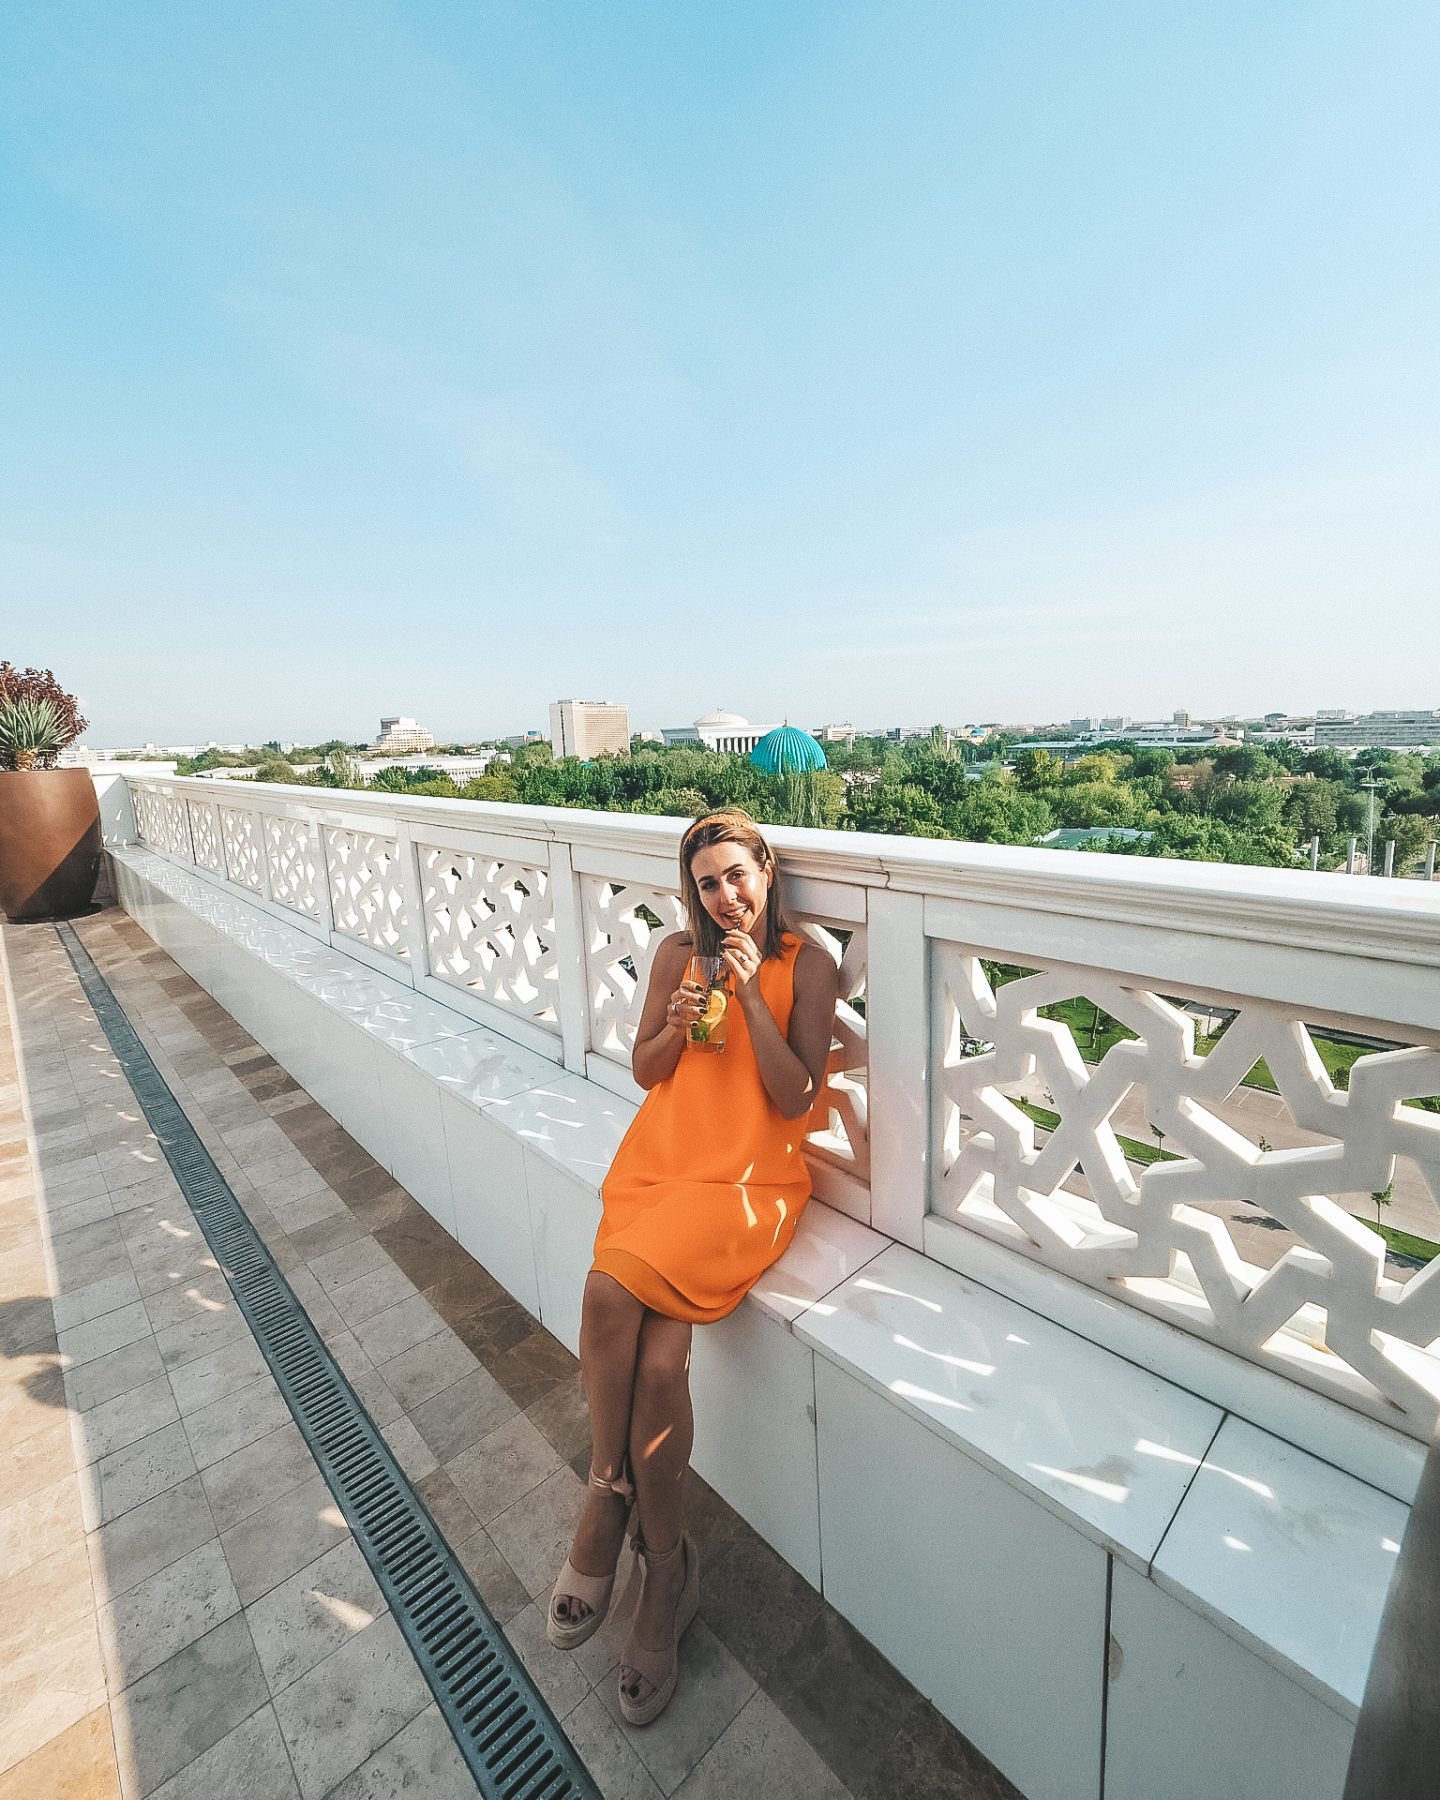 The Rooftop at the Hyatt Regency Tashkent